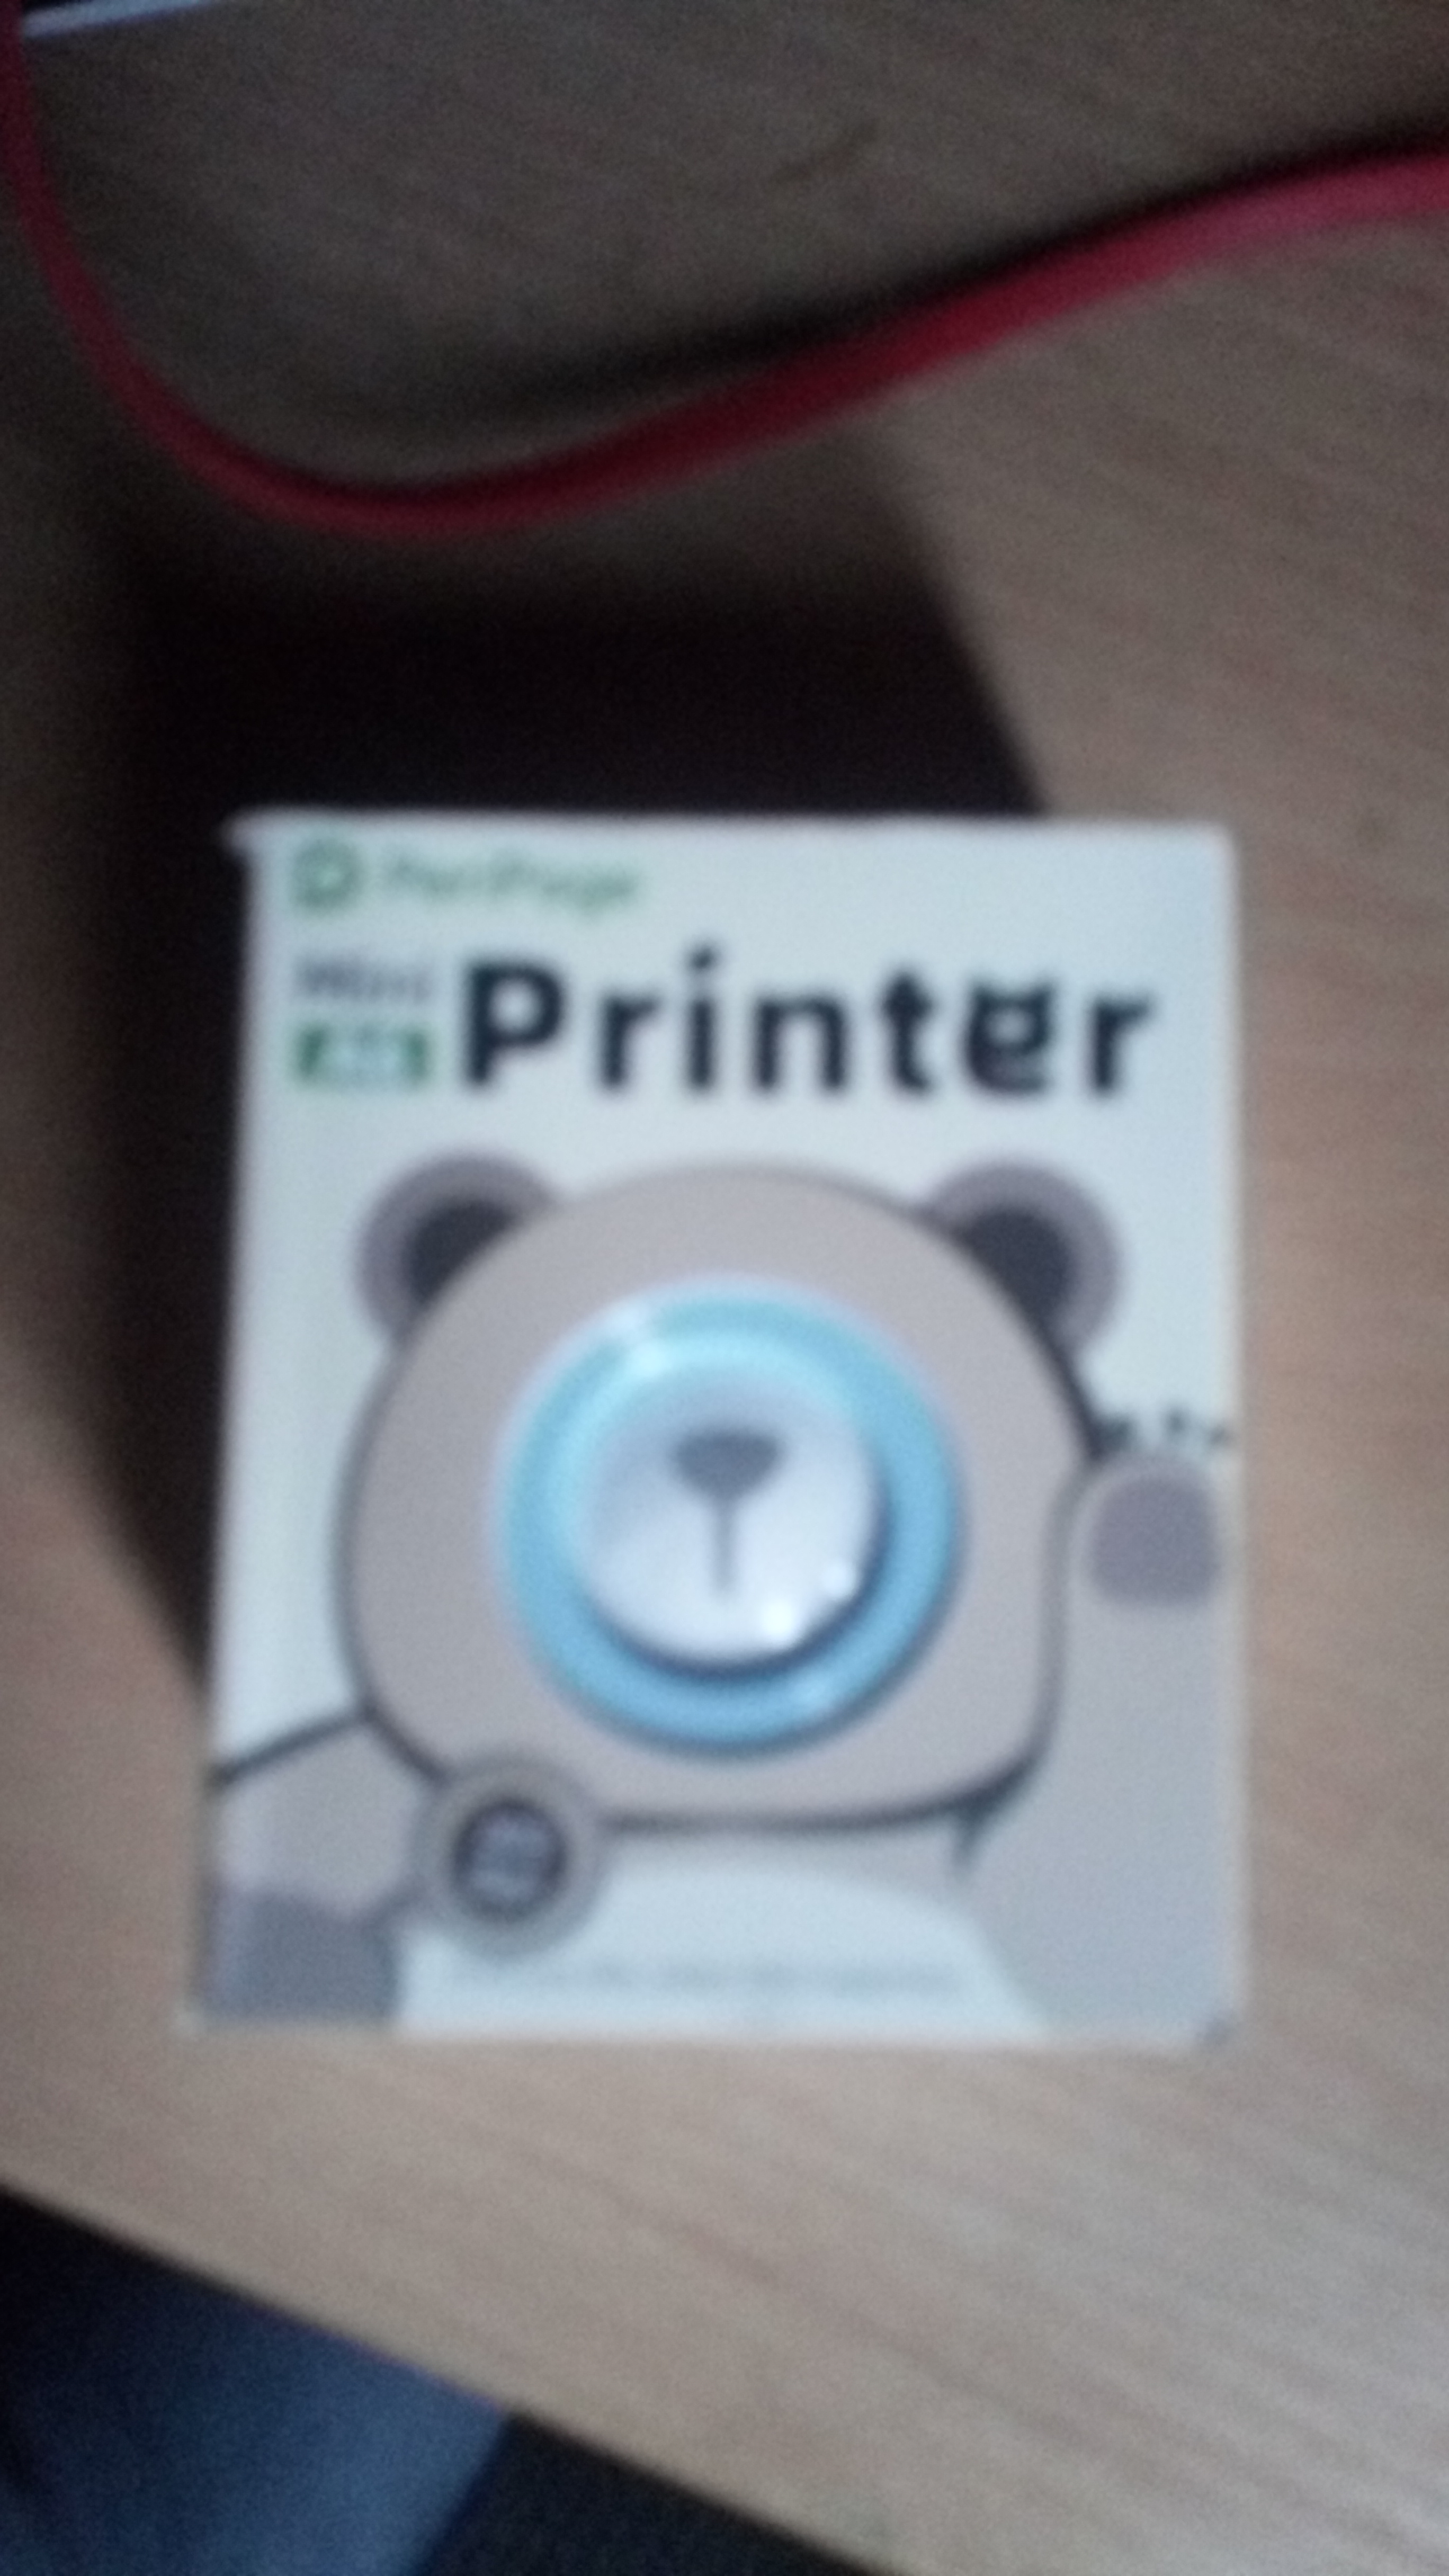 GOOJPRT Wireless Inkless Thermal Printer Supplies Thermal Label Sticker Paper Imprimante Photo Printer Android IOS Mobile Phone Printers     - AliExpress